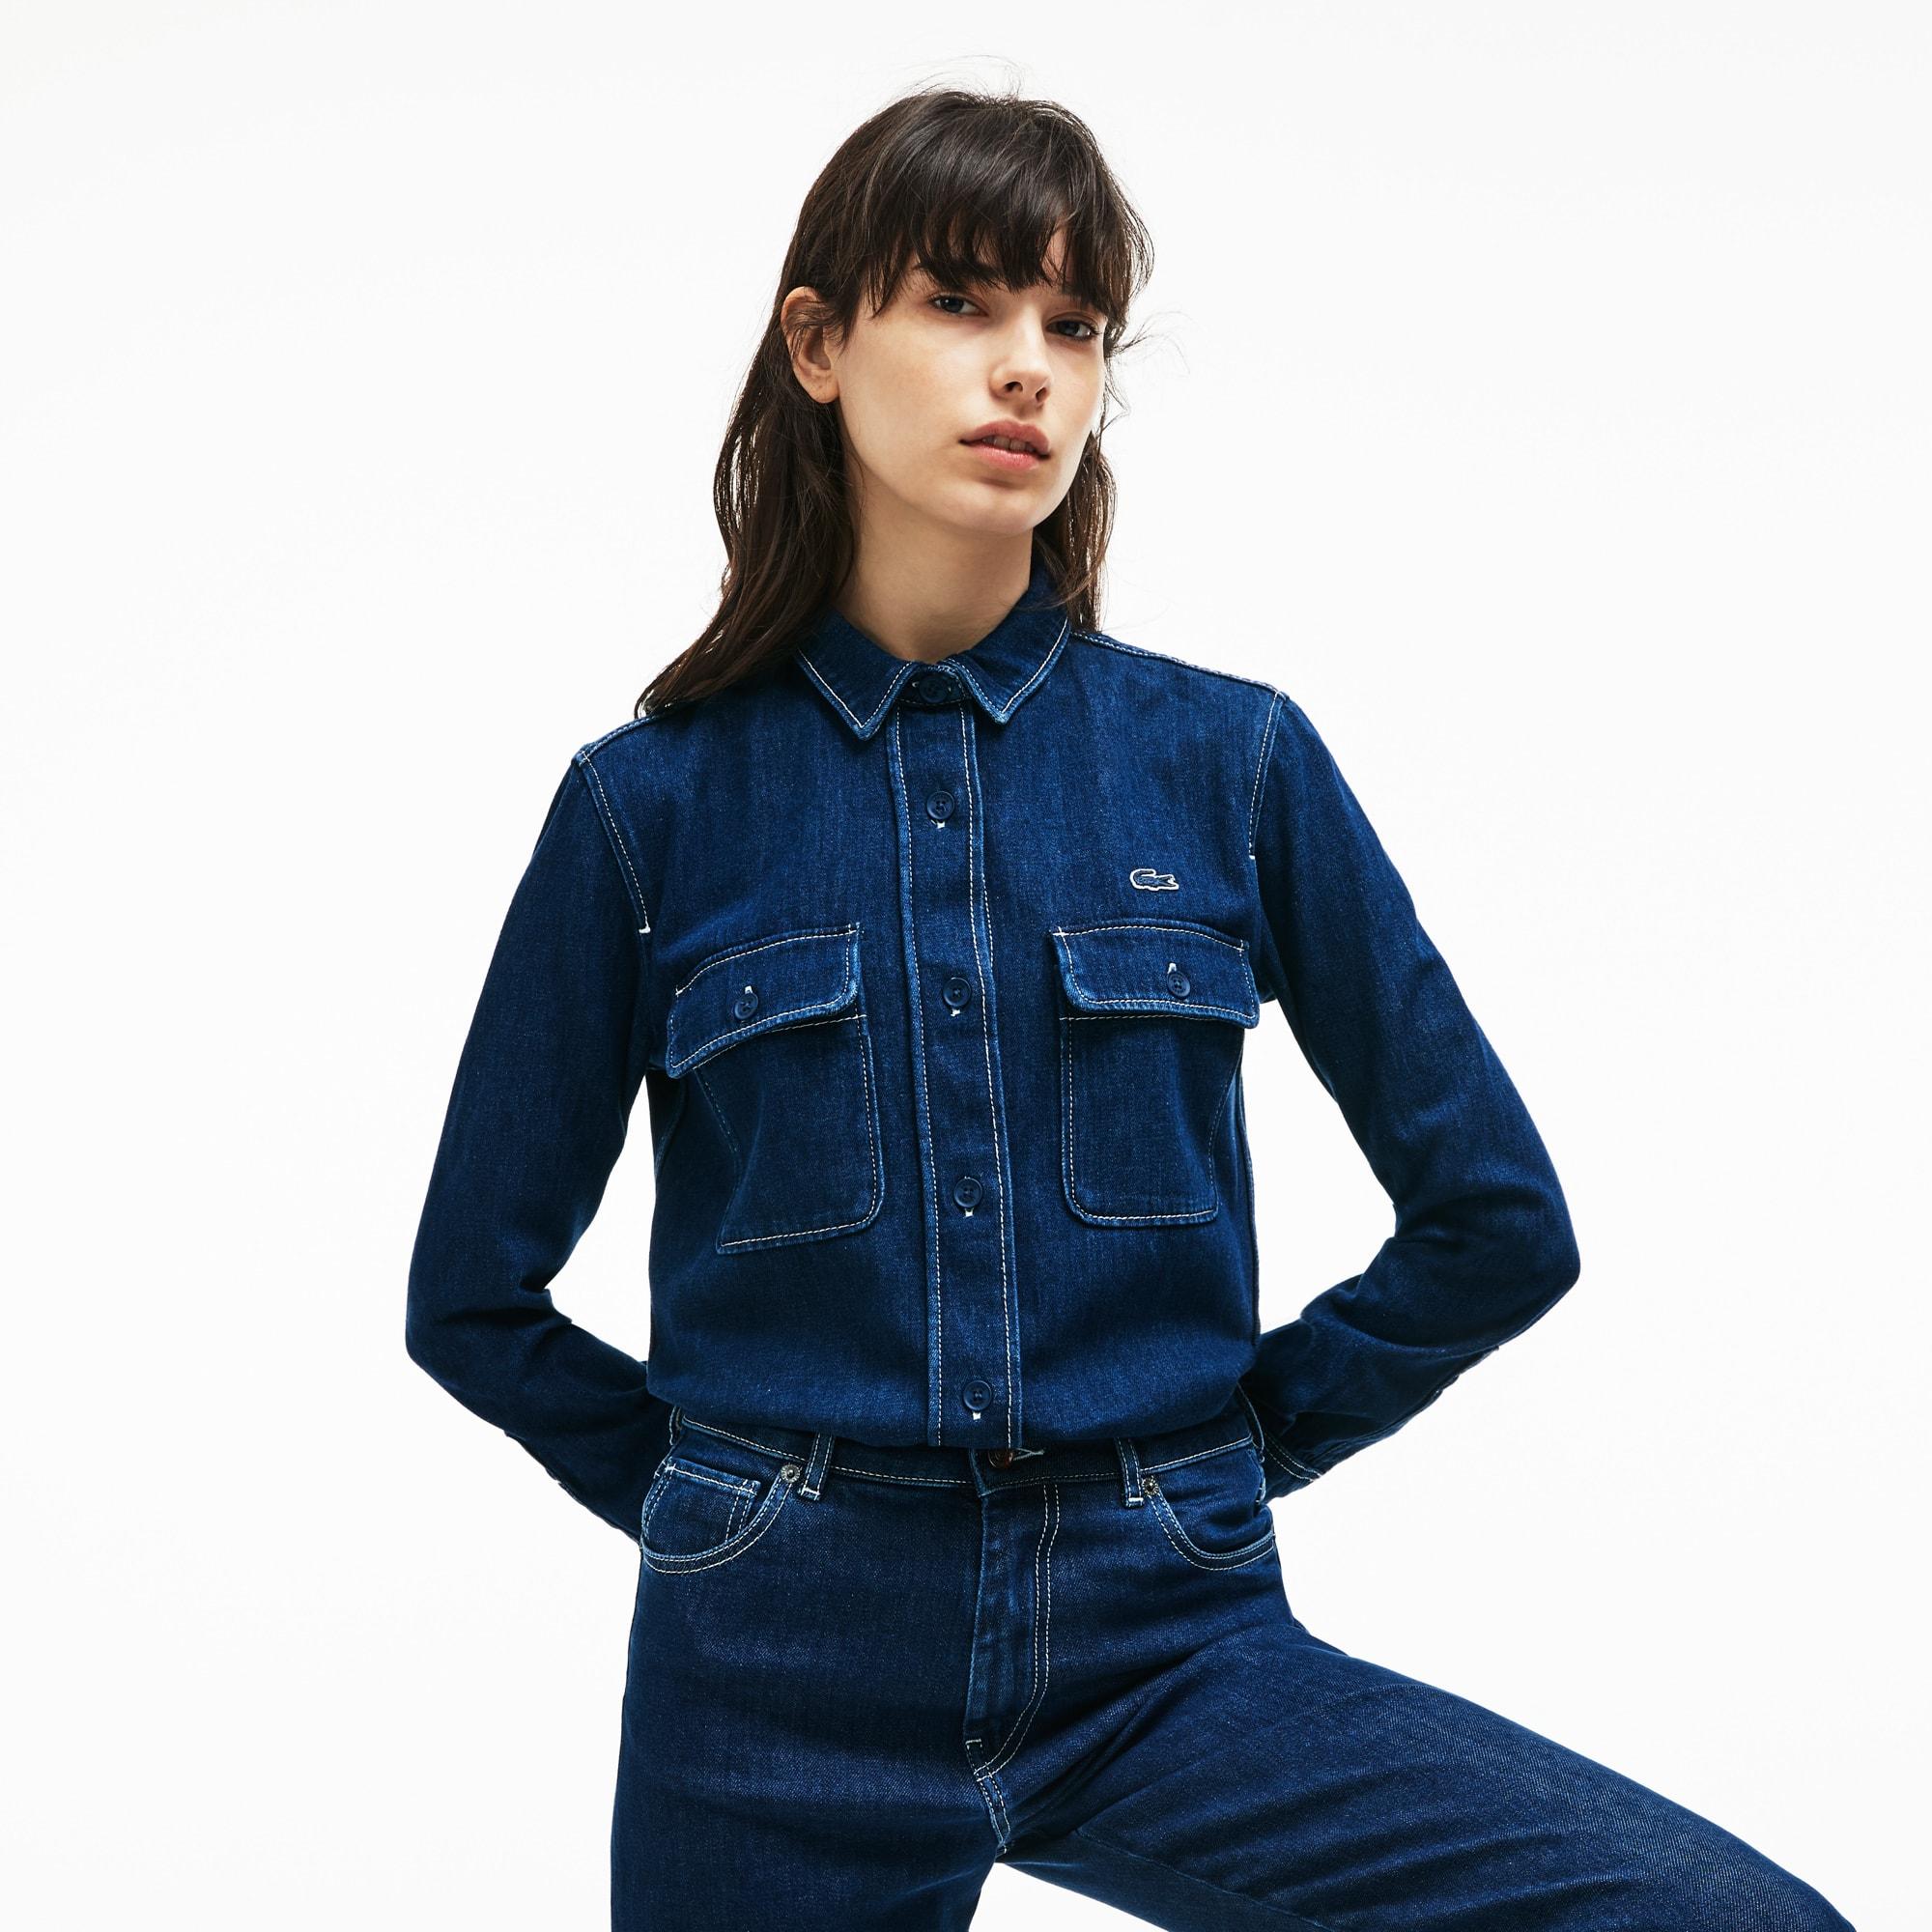 Camicia regular fit in jeans con cuciture a contrasto